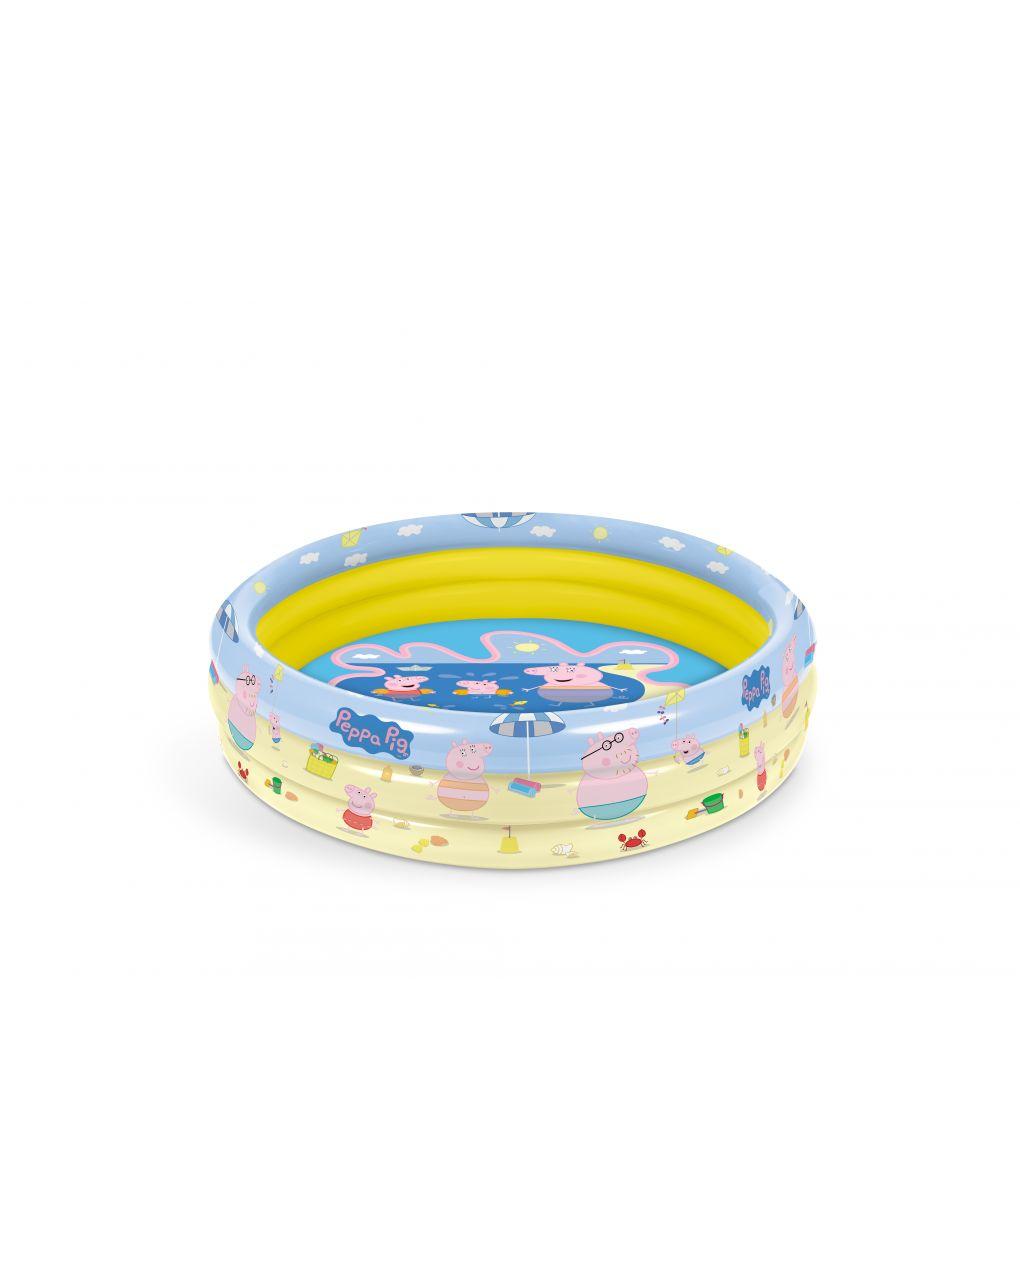 Mondo - peppa pig piscina 3 anelli d. 100 cm - Mondo